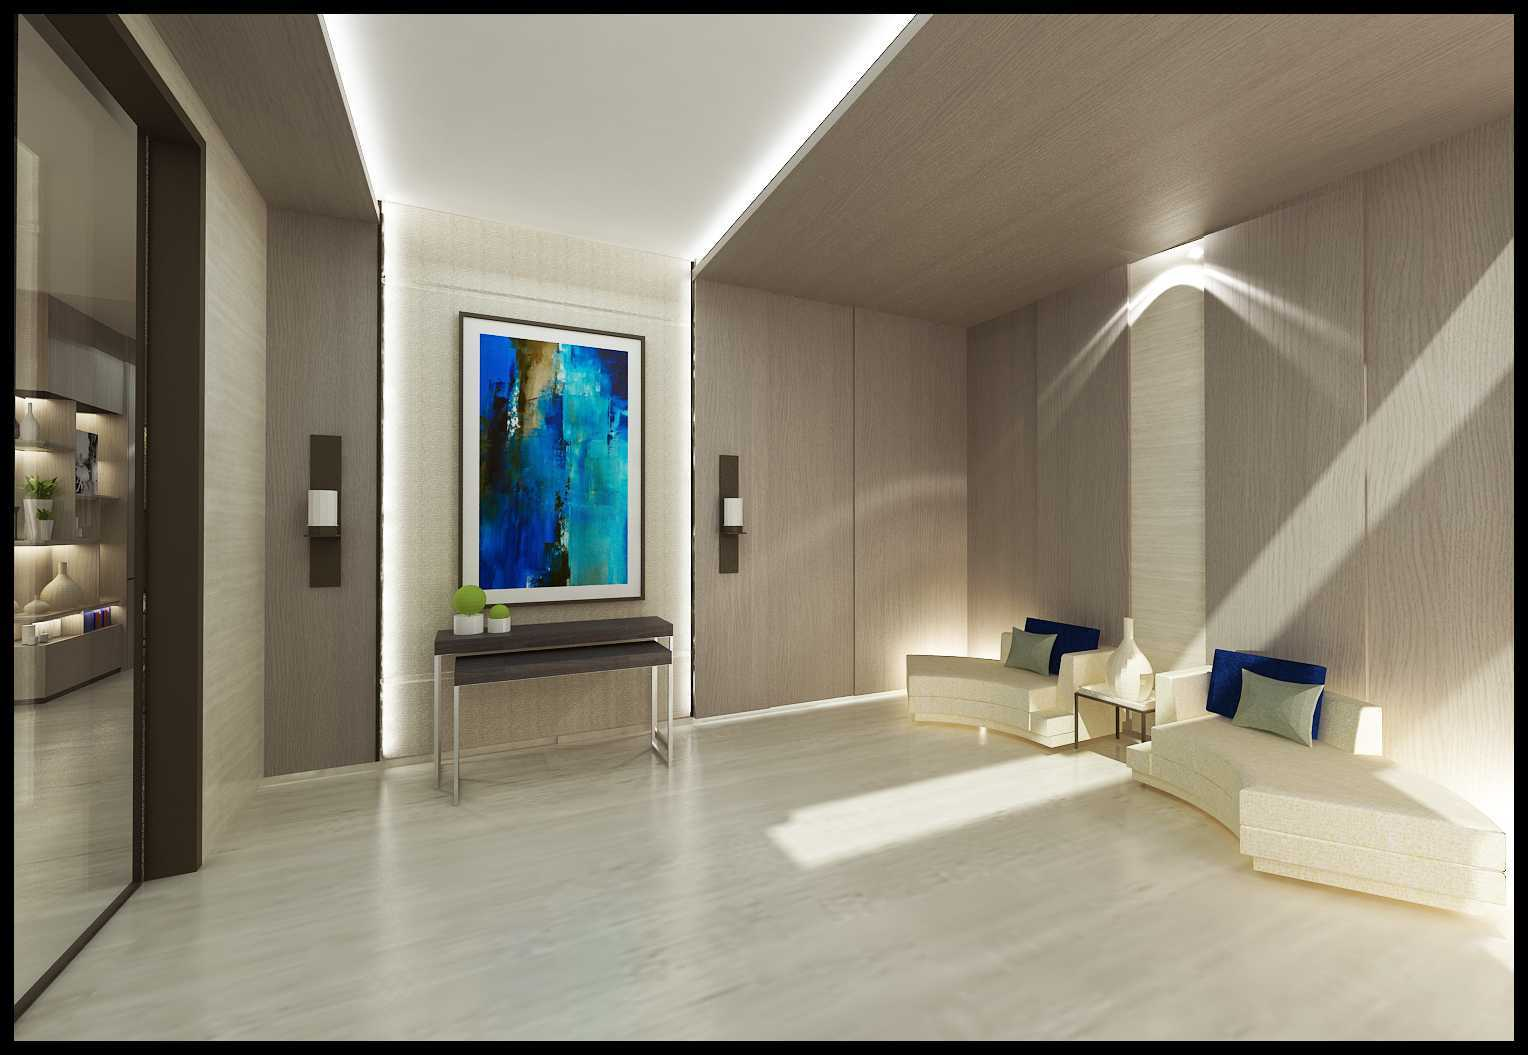 Ed Architect Modern Private House 2 Kelapa Gading, North Jakarta City, Jakarta, Indonesia Kelapa Gading, North Jakarta City, Jakarta, Indonesia Final-Ruang-Tamu Modern  34399